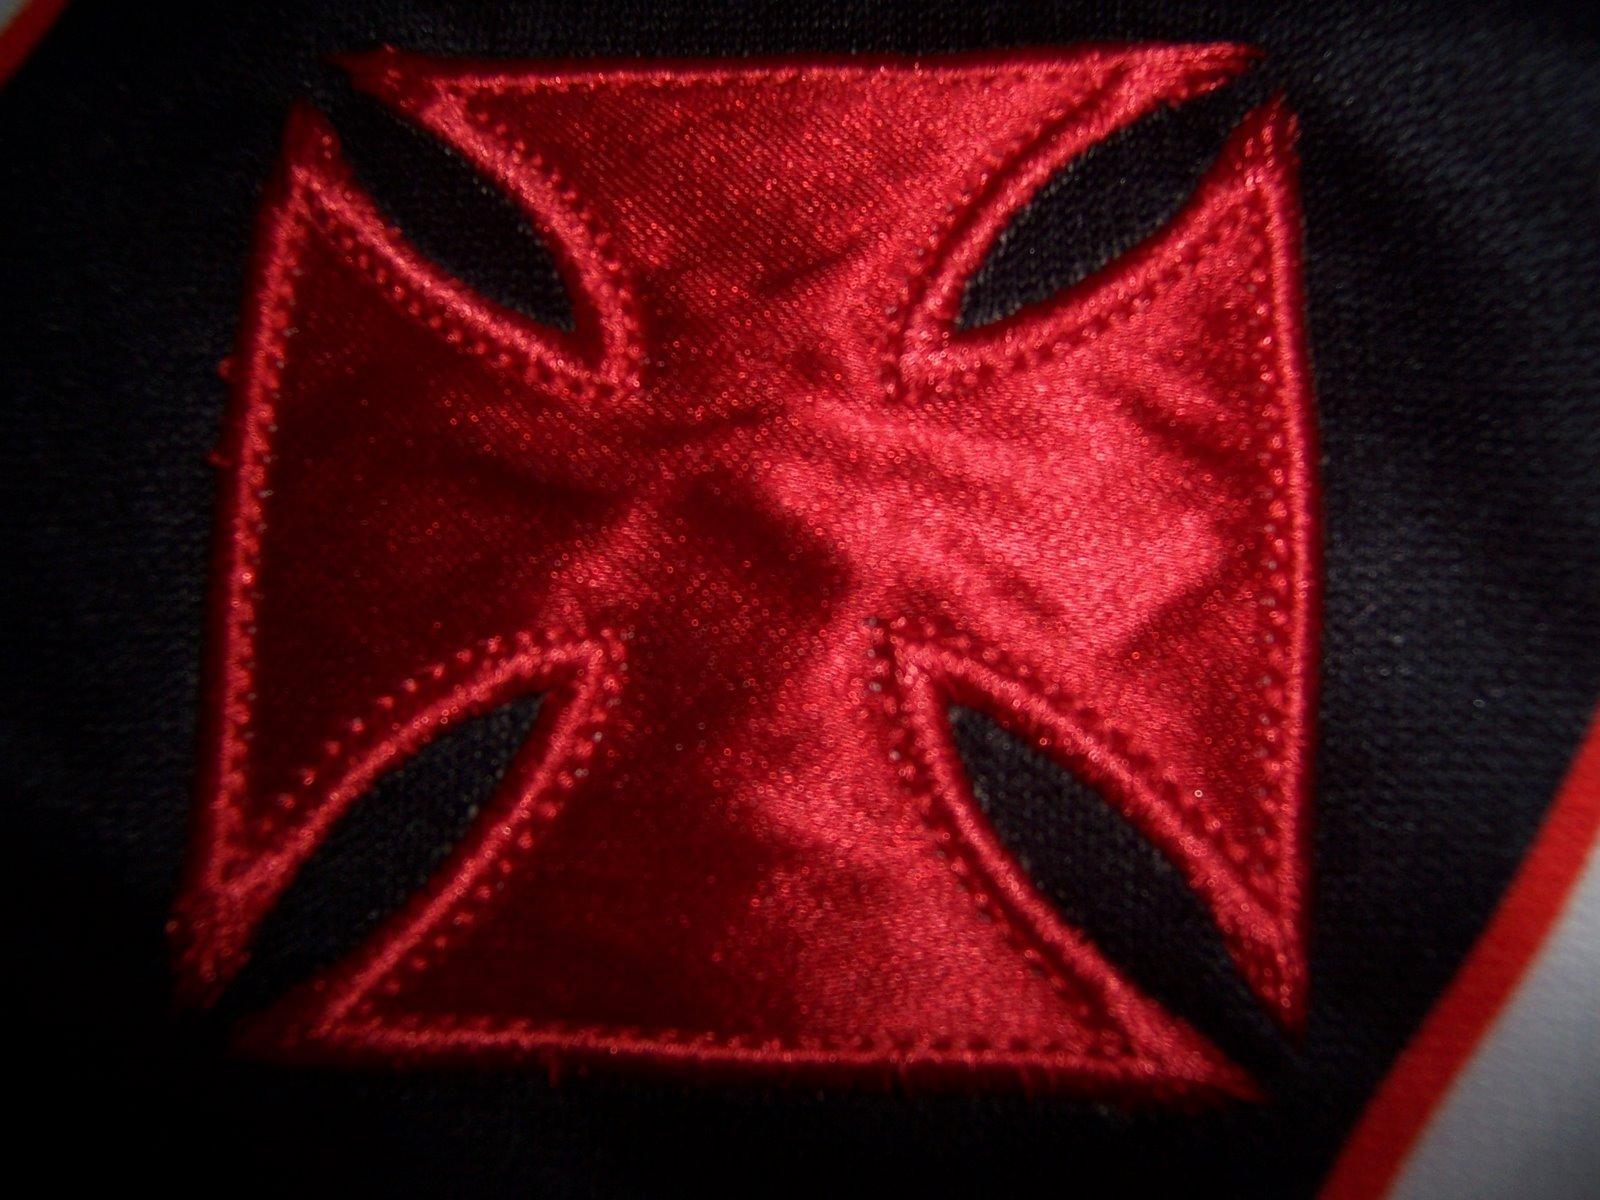 http://4.bp.blogspot.com/-PKGEzKXazjo/T_NpvP0VTgI/AAAAAAAADiU/fQXittyx-OA/s1600/escudo_vasco.jpg